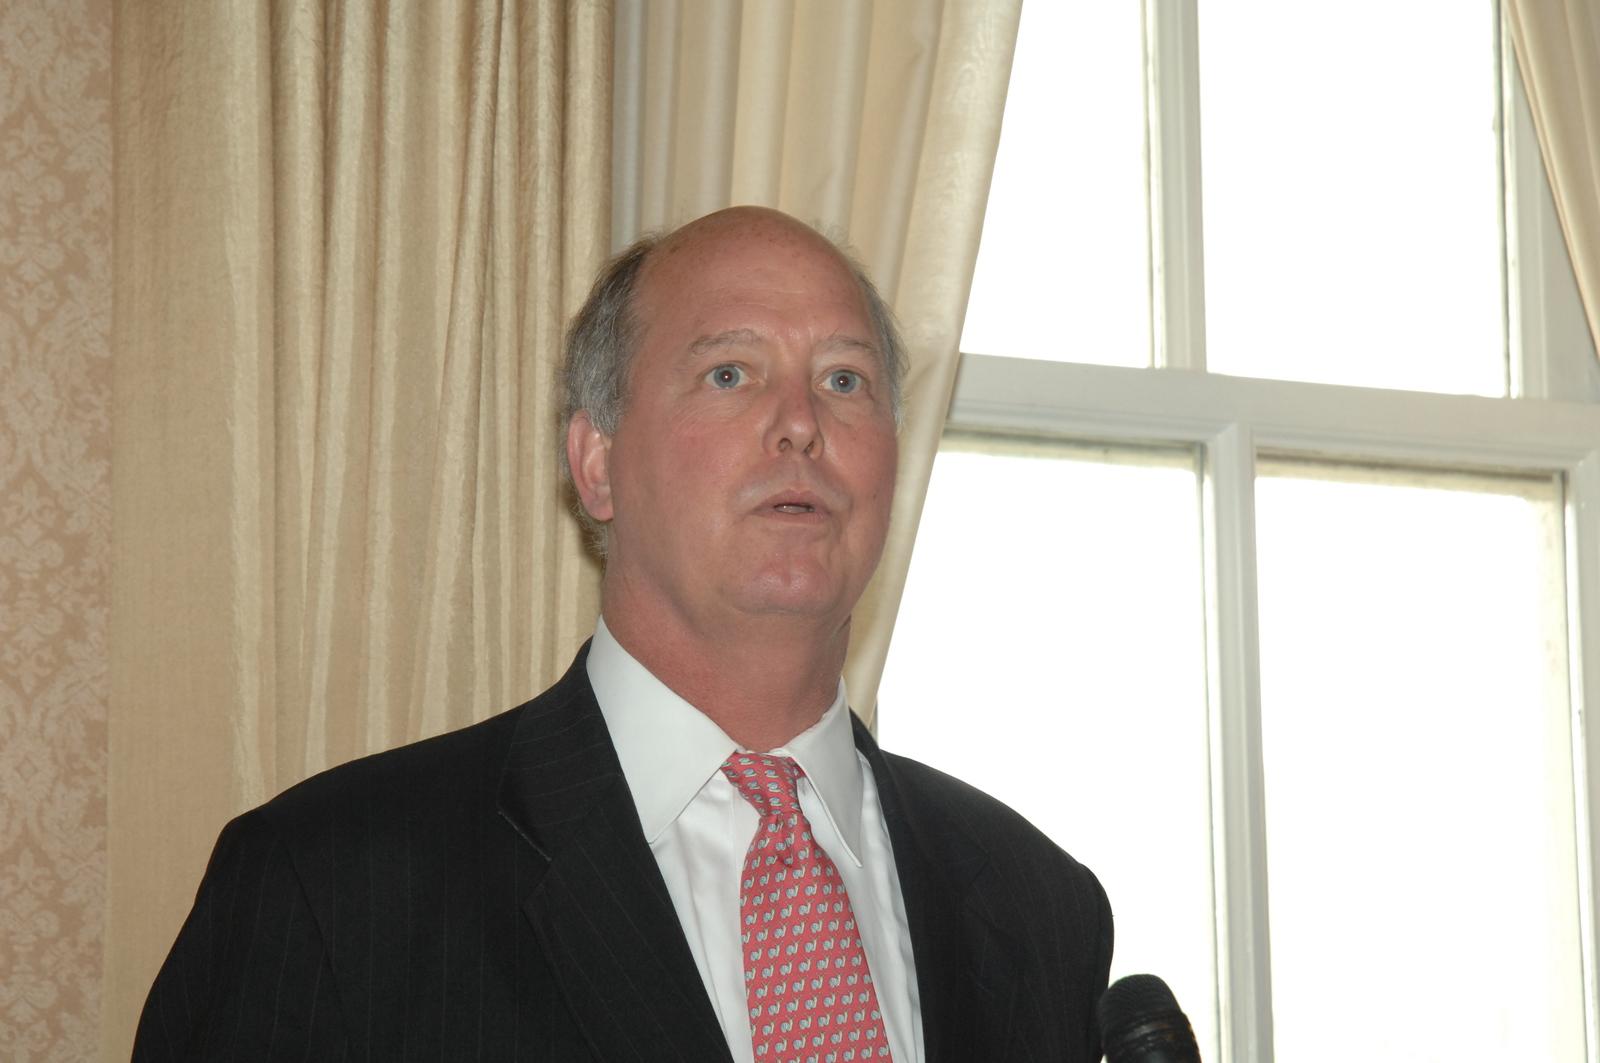 Robert Kenison Retirement Event - Retirement ceremony for Robert Kenison, Associate General Counsel for Assisted Housing and Community Development, HUD staff member since 1966